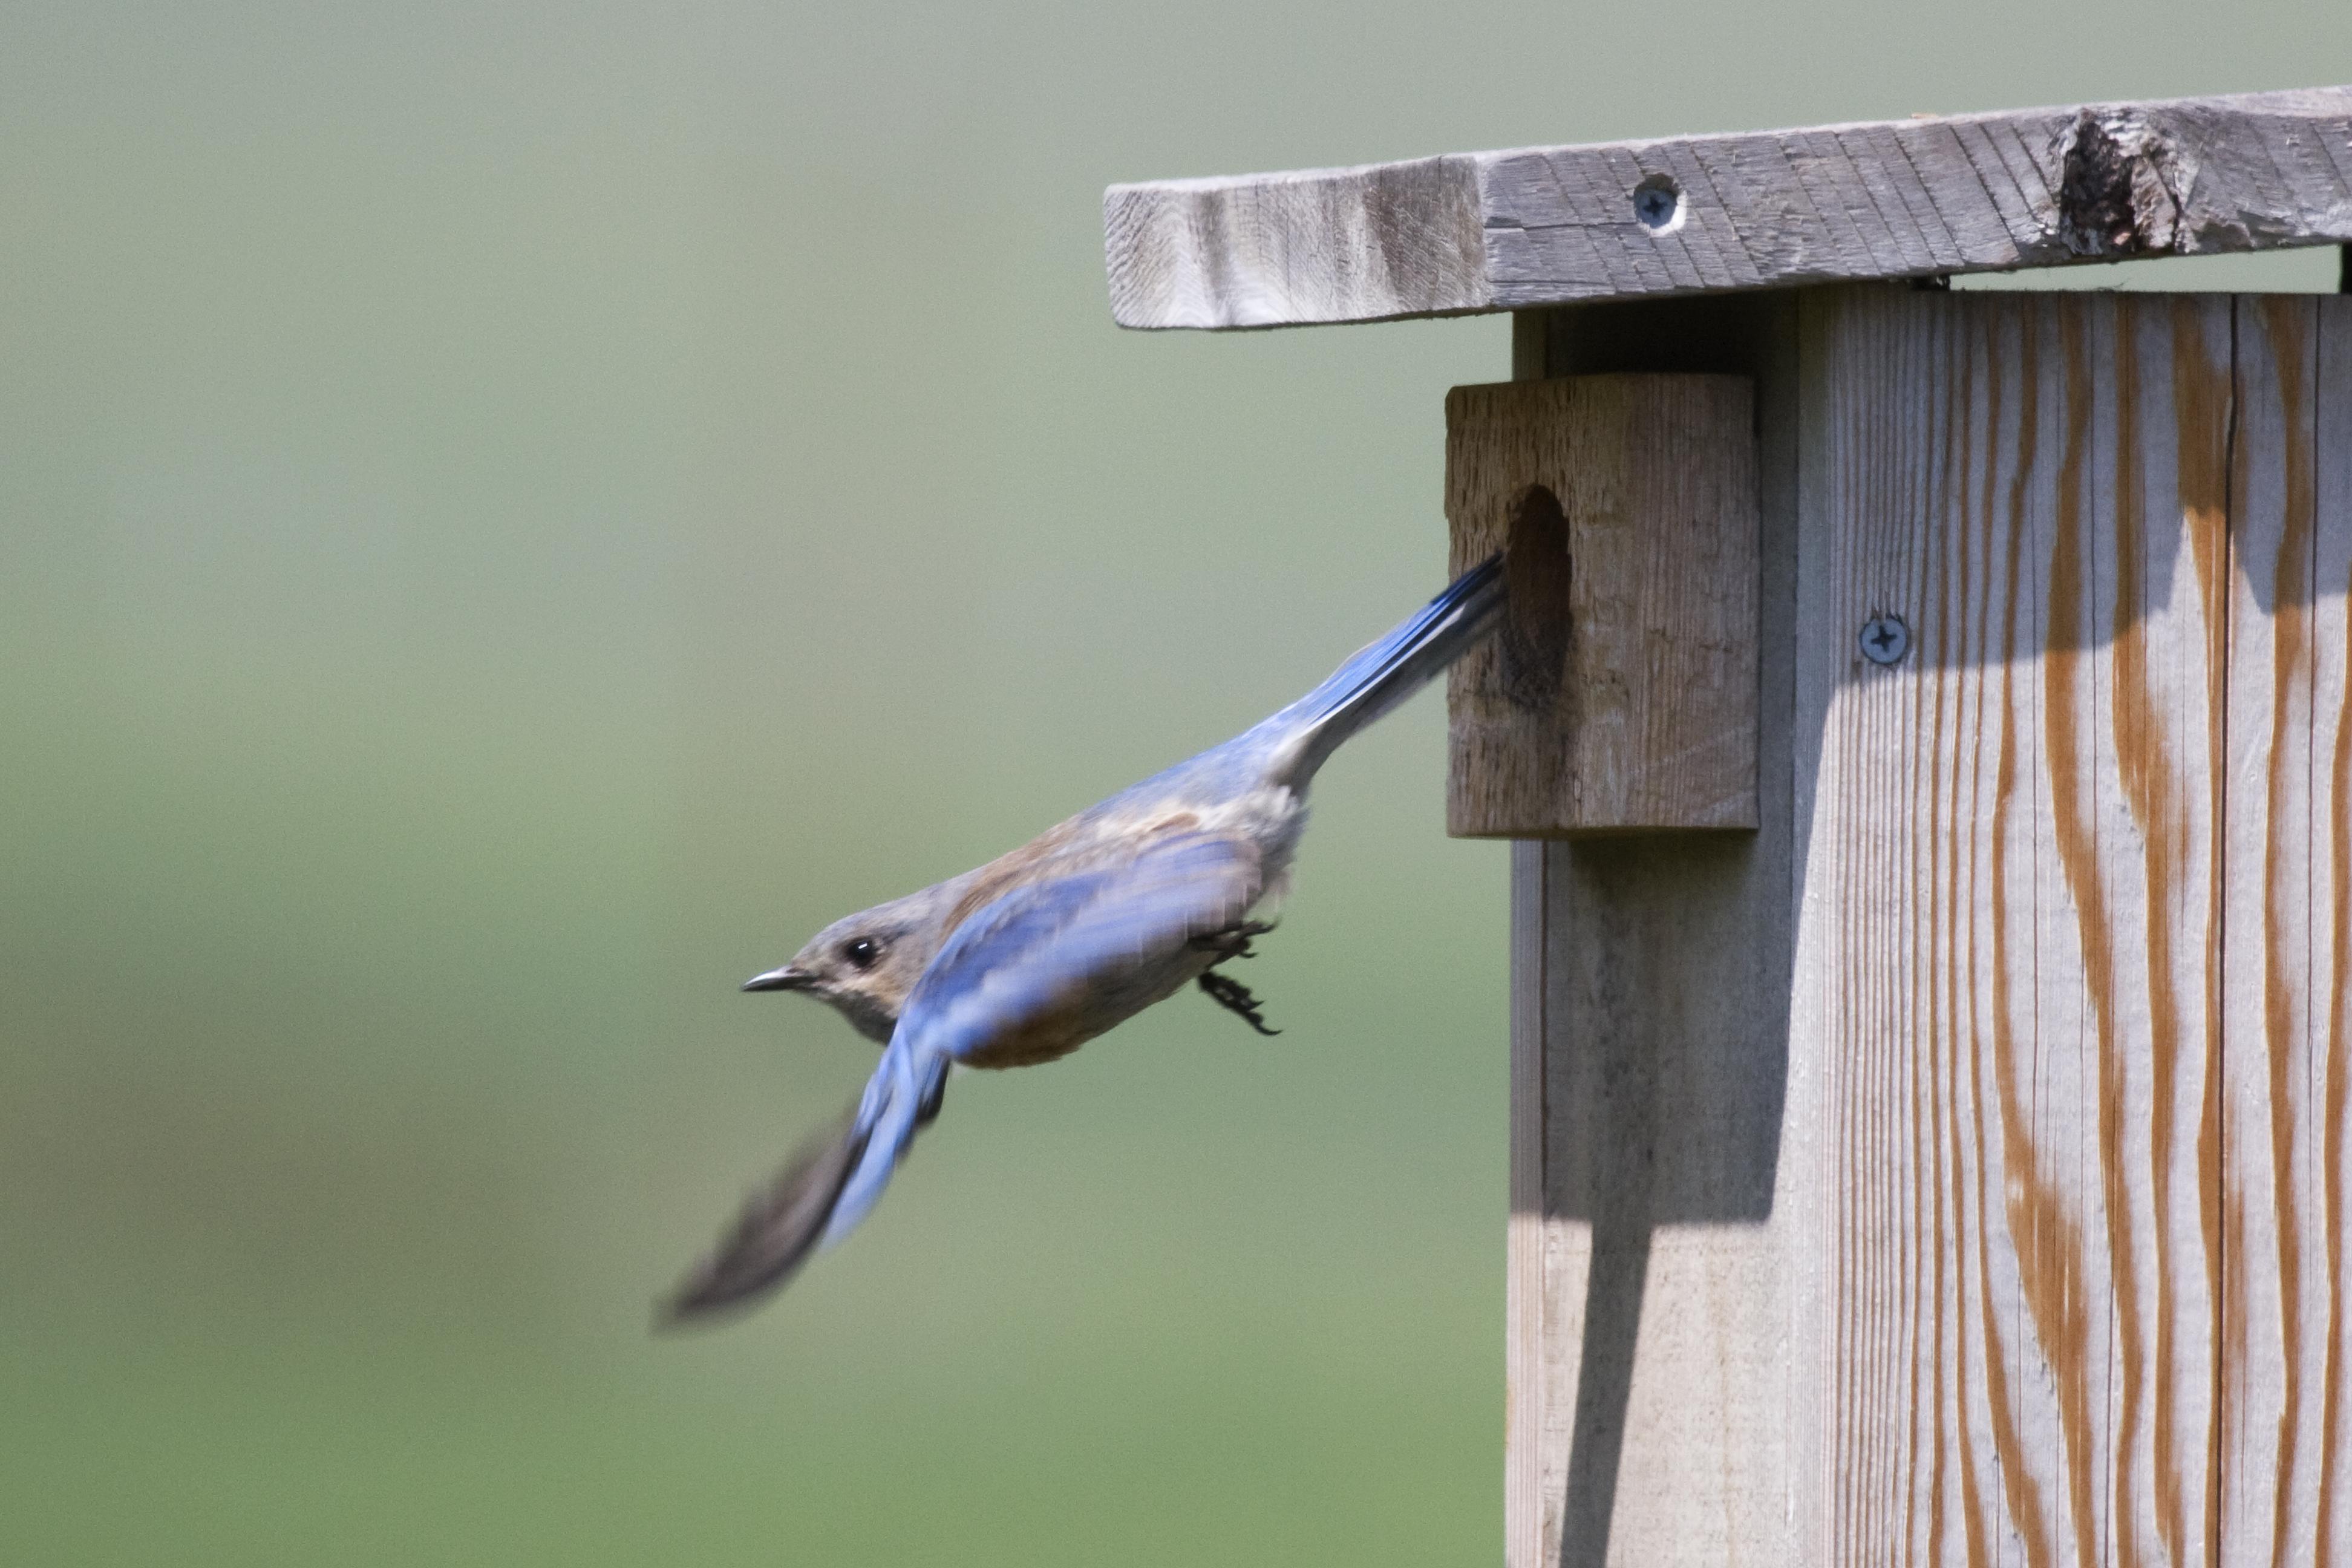 http://commons.wikimedia.org/wiki/File:Western_Bluebird_leaving_nest_box.jpg